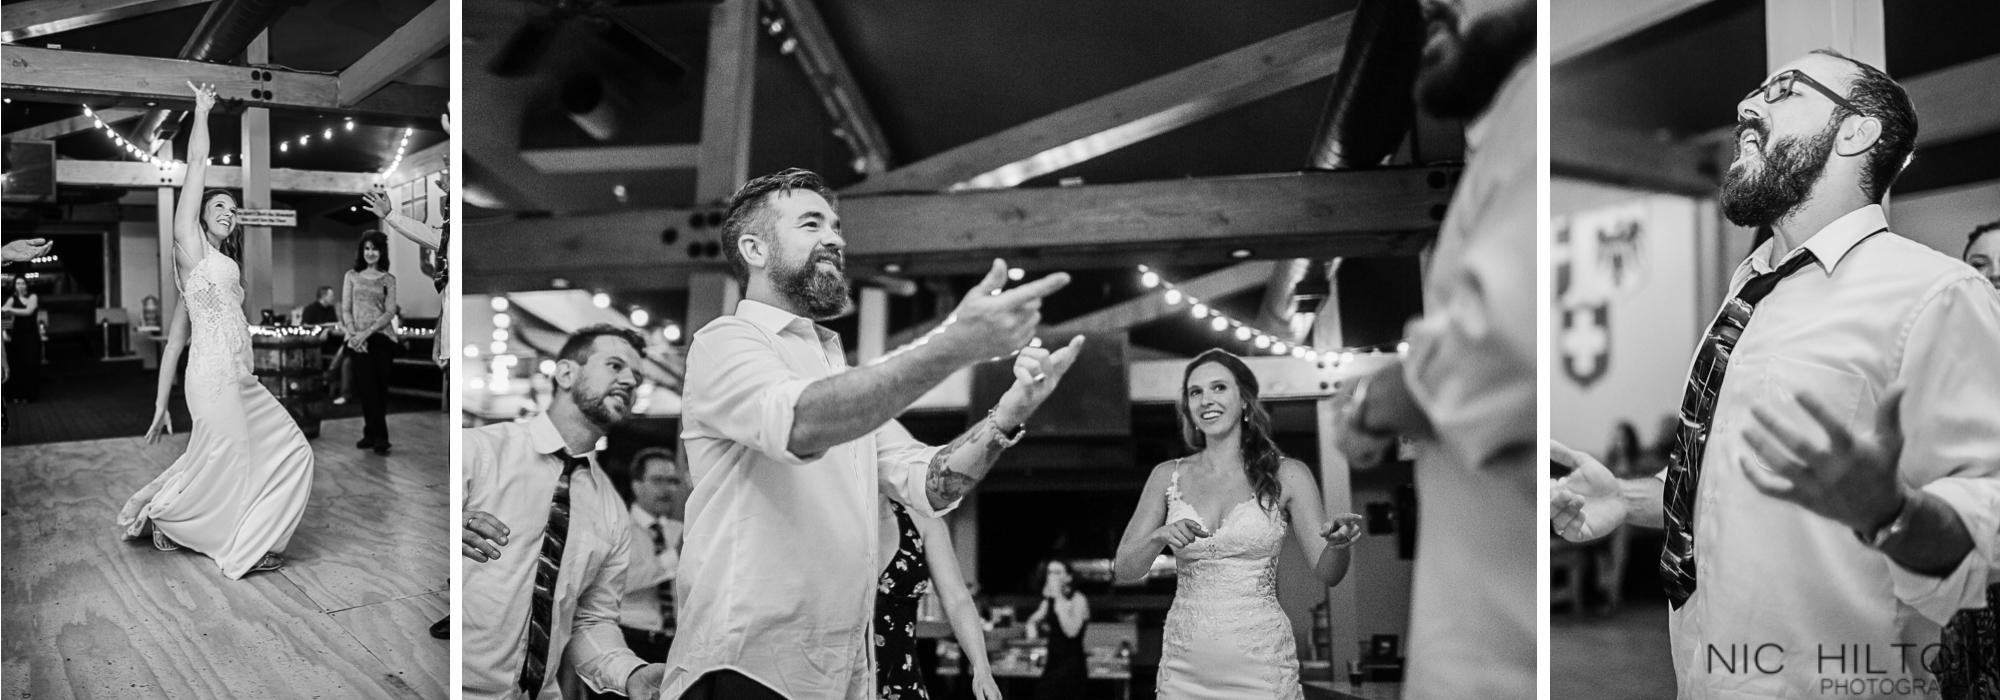 Dancing-photos-mammoth-brewery.jpg